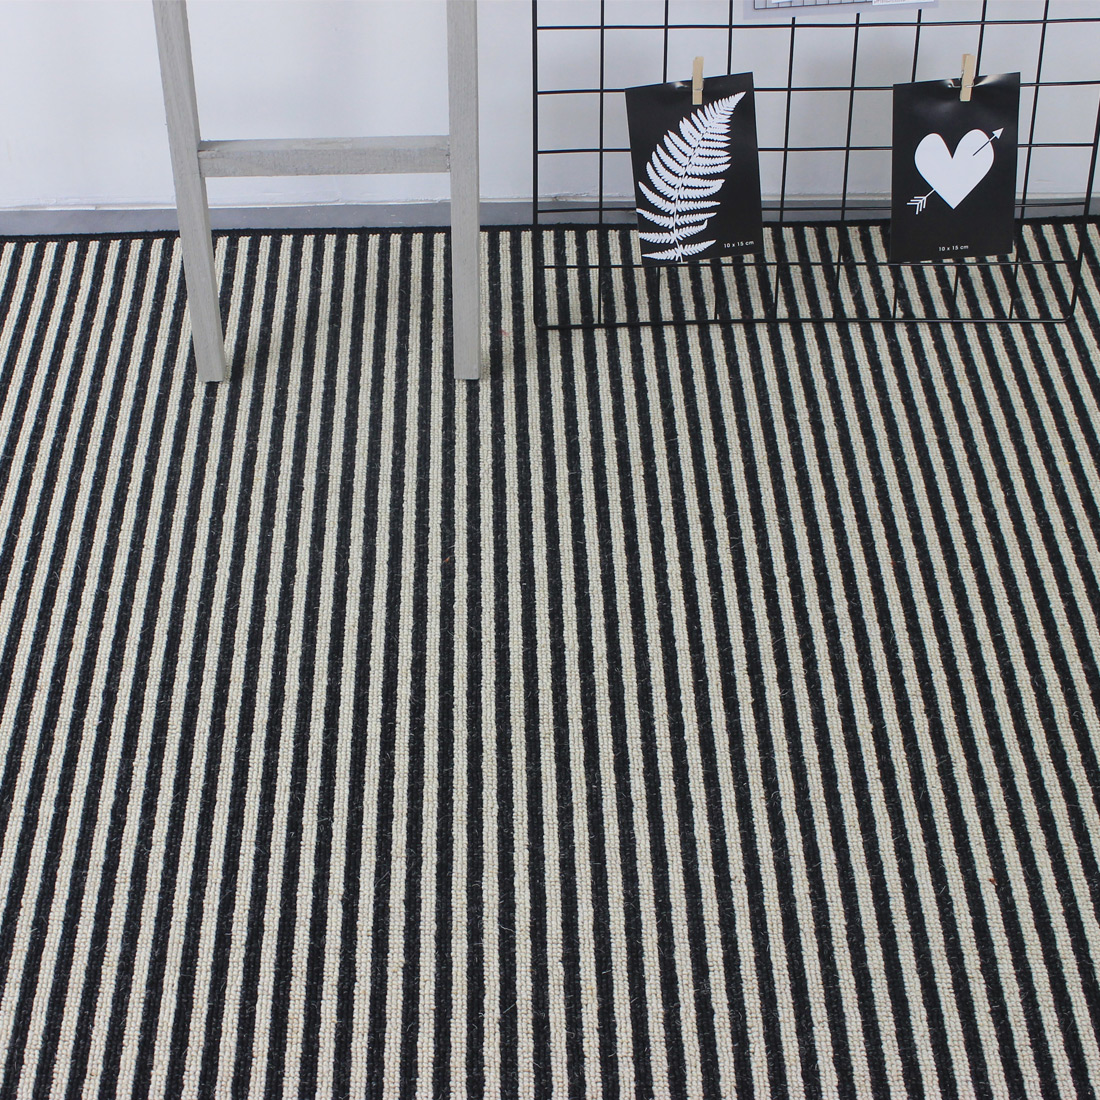 Vloerkleed Boston (wol) Stripe Zebra | 200 x 300 cm